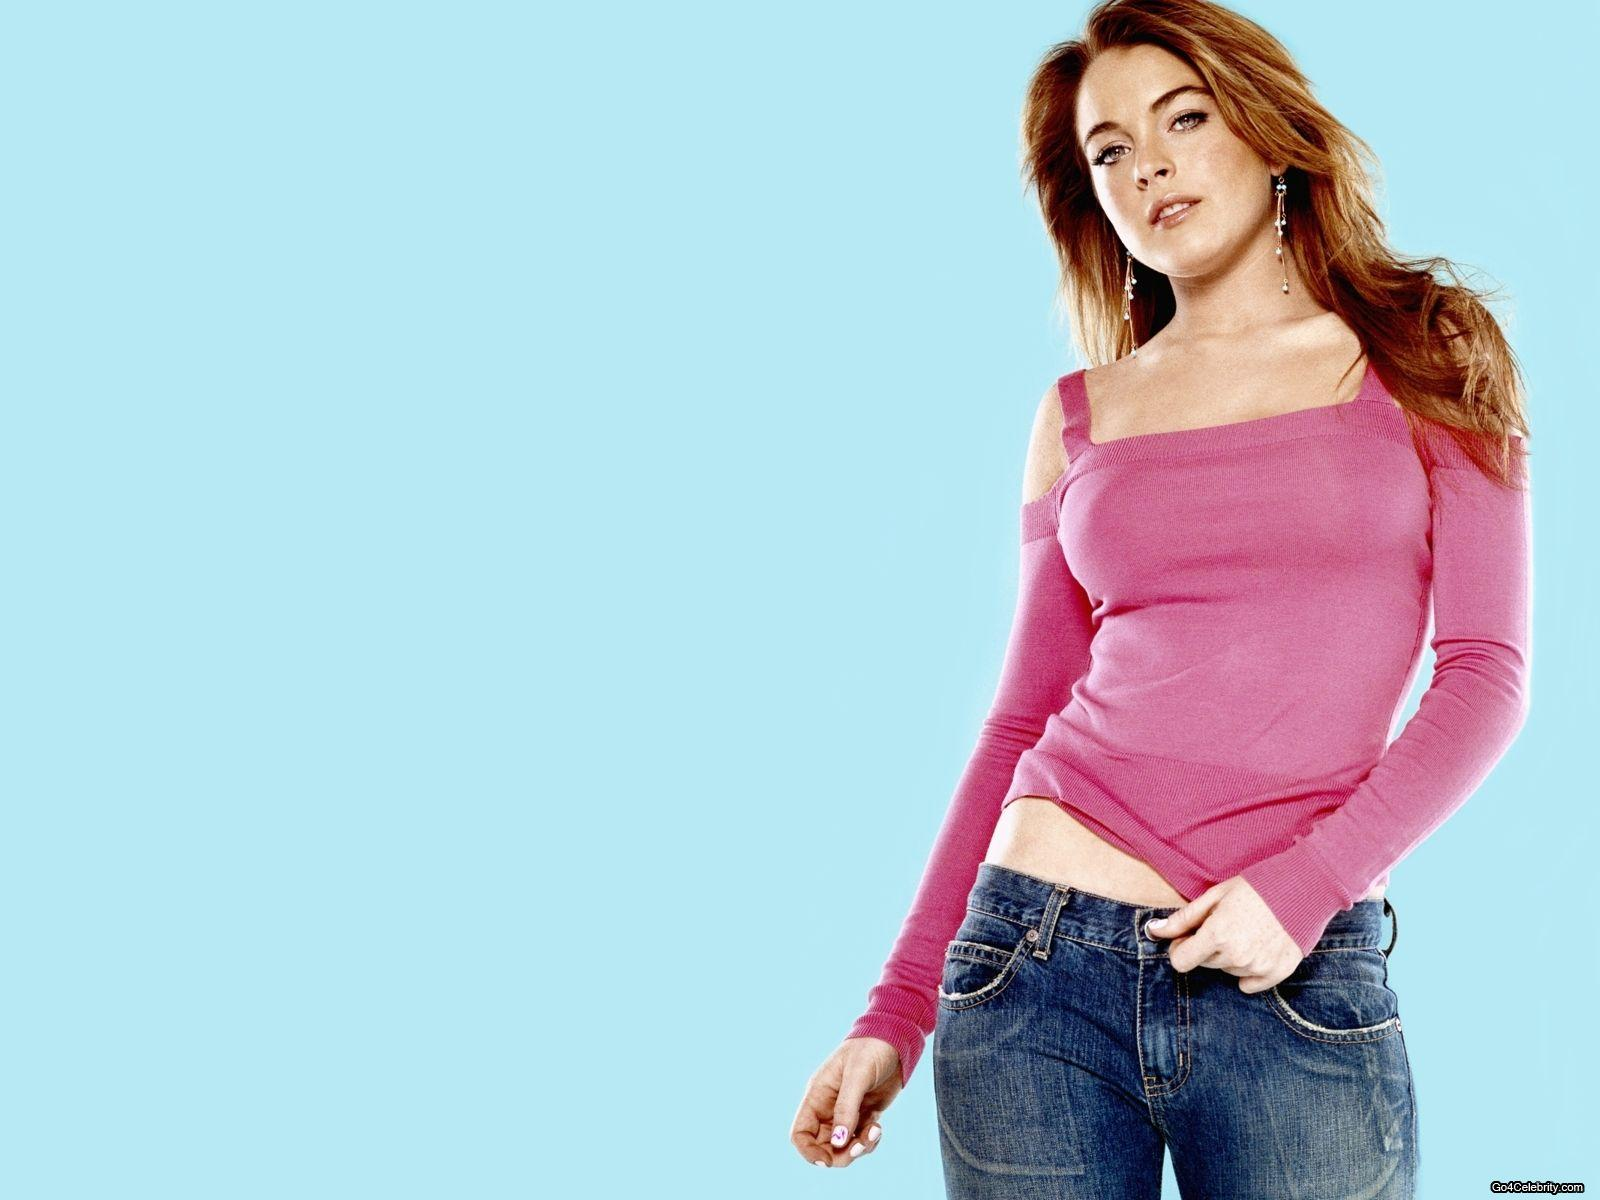 Lindsay Lohan,lindsay lohan playboy 2012,lindsay lohan twitter,lindsay ... Lindsay Lohan